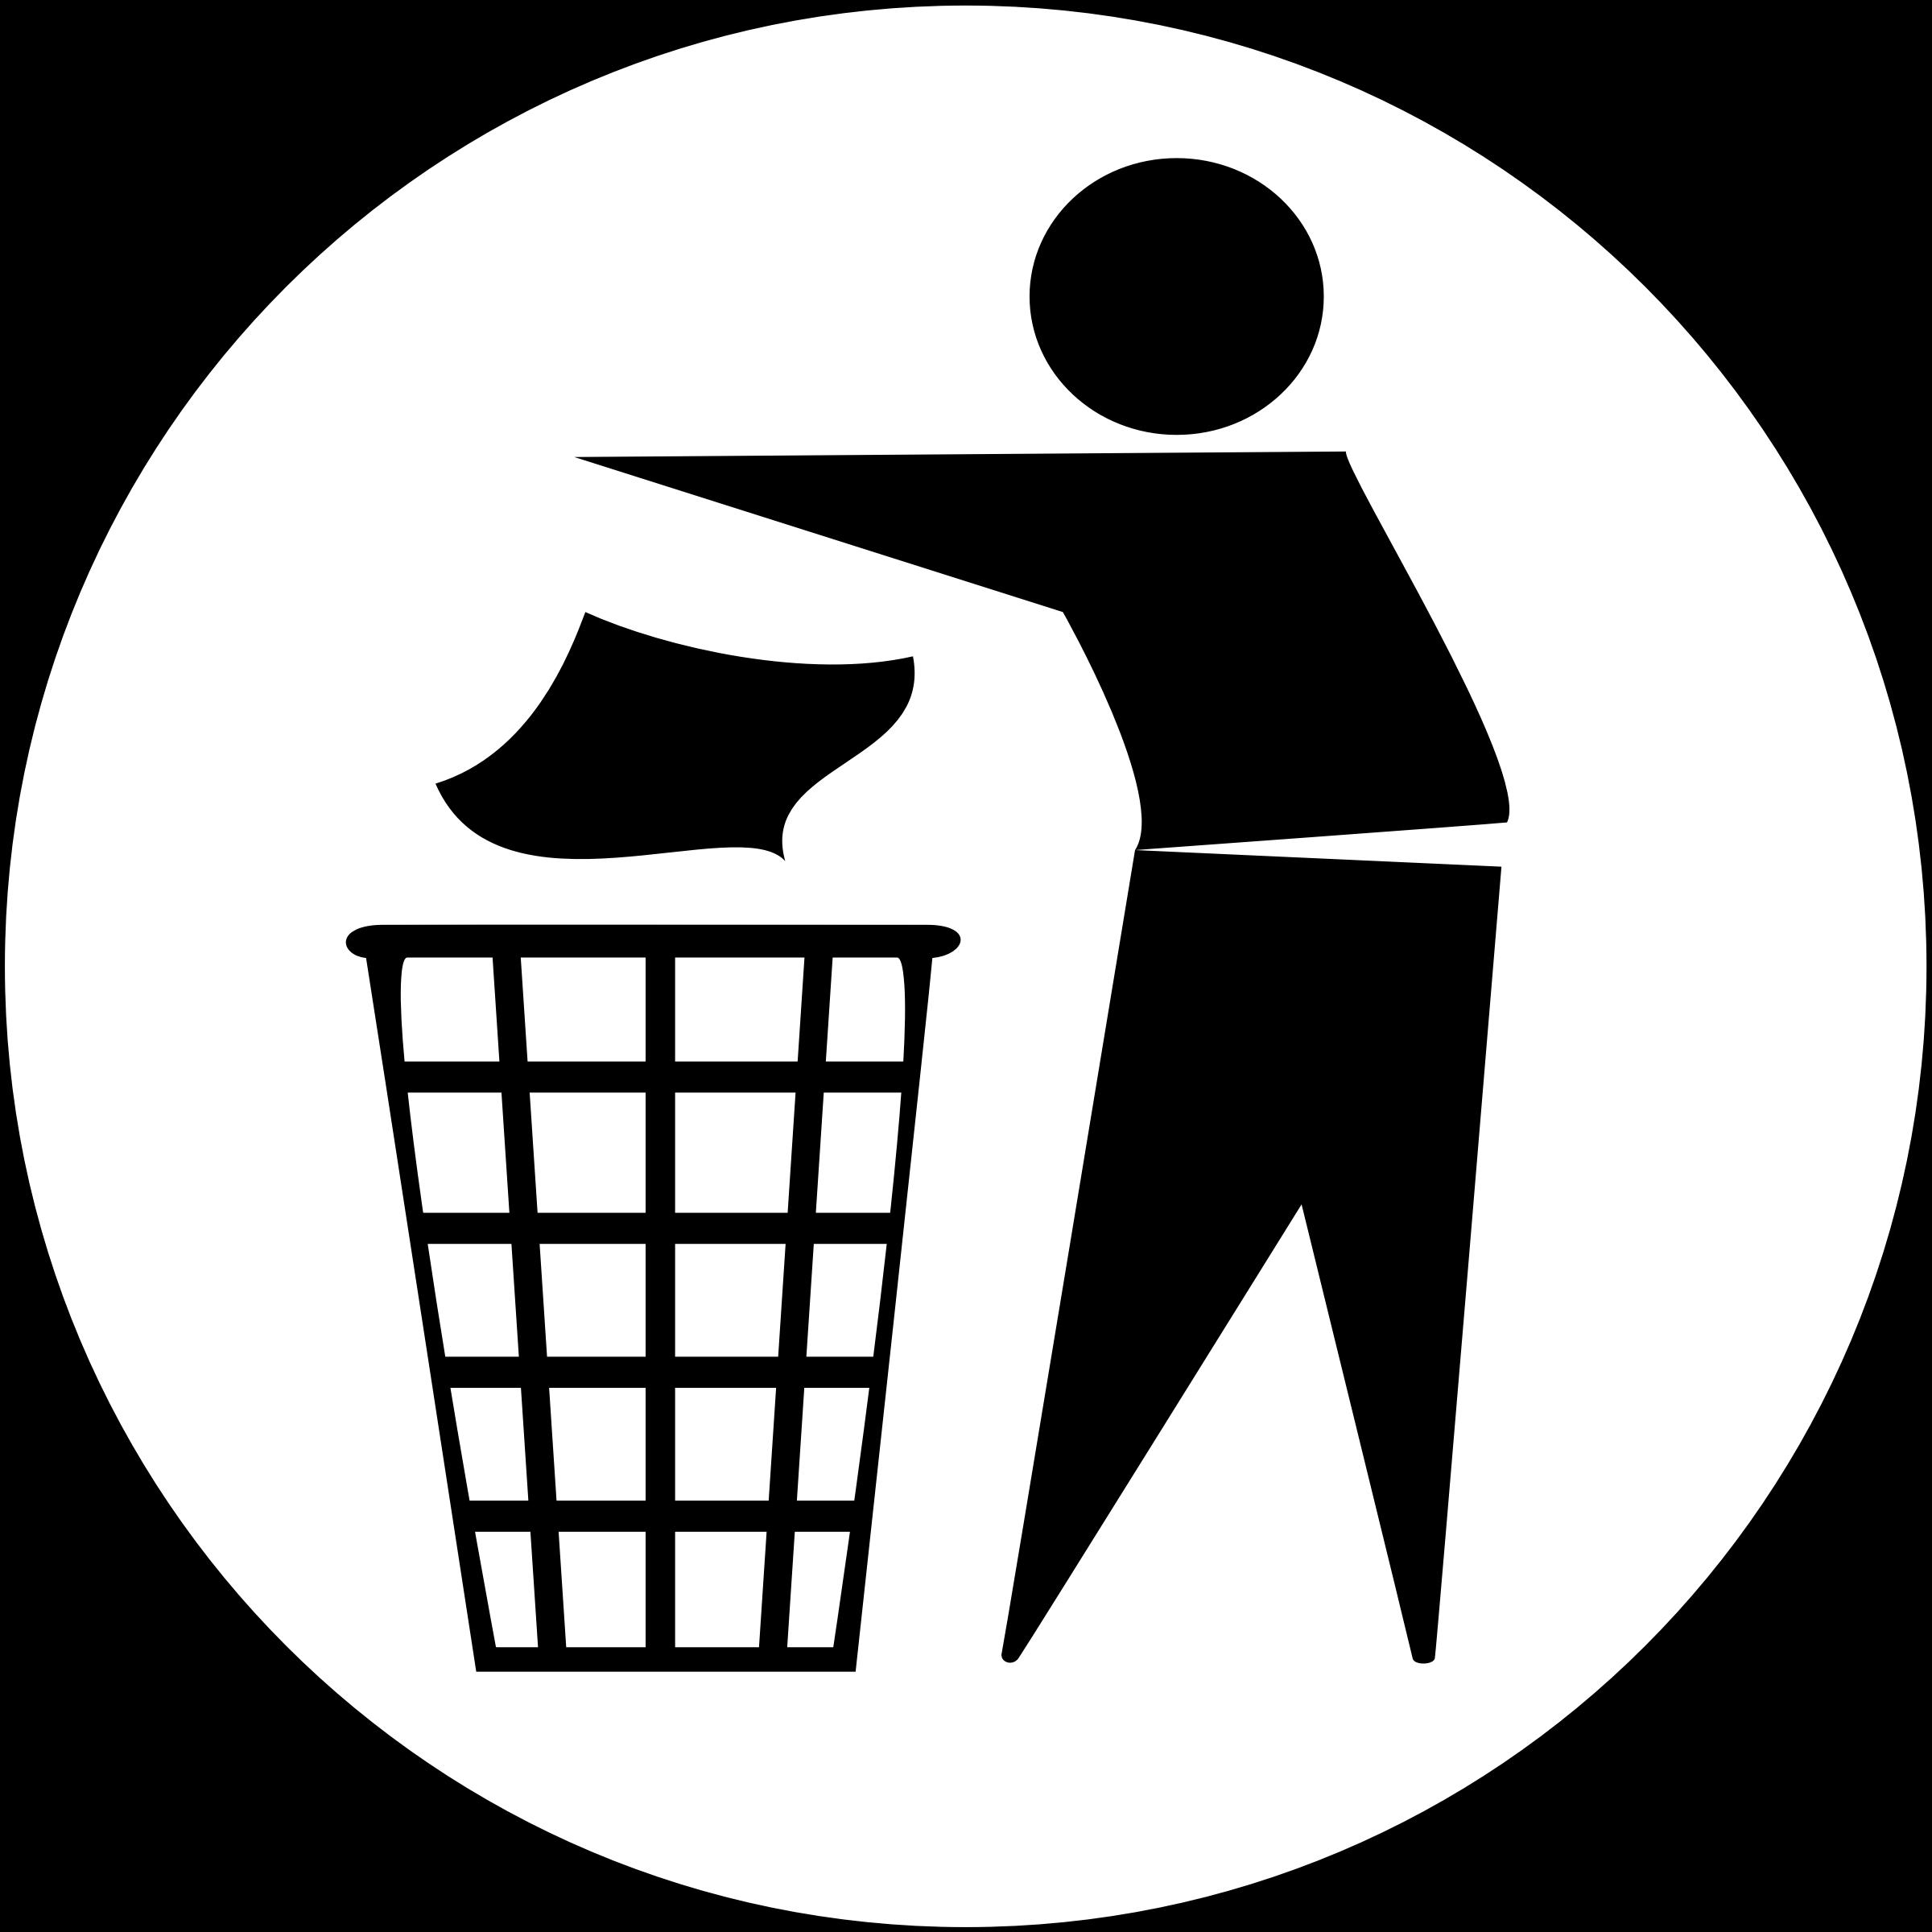 Garbage clipart classroom. Beautifulhealer put rubbish in